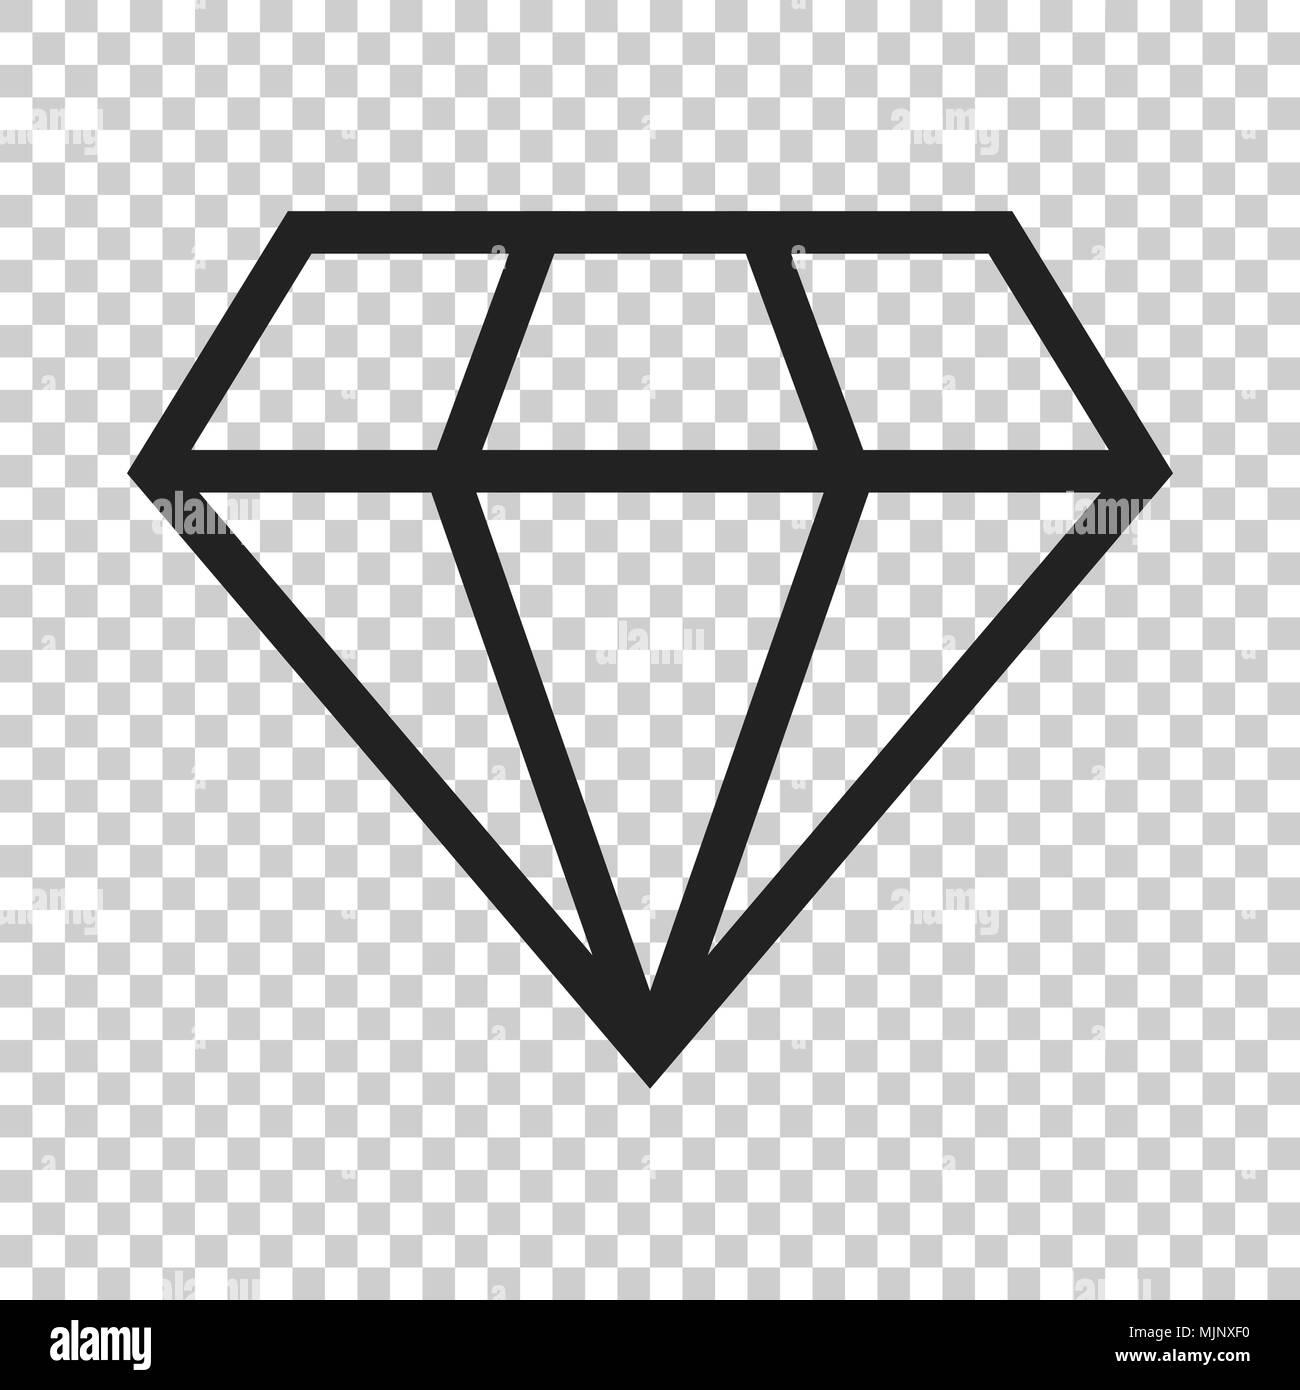 Diamond jewel gem vector icon in flat style. Diamond gemstone illustration on isolated transparent background. Jewelry brilliant concept. - Stock Image